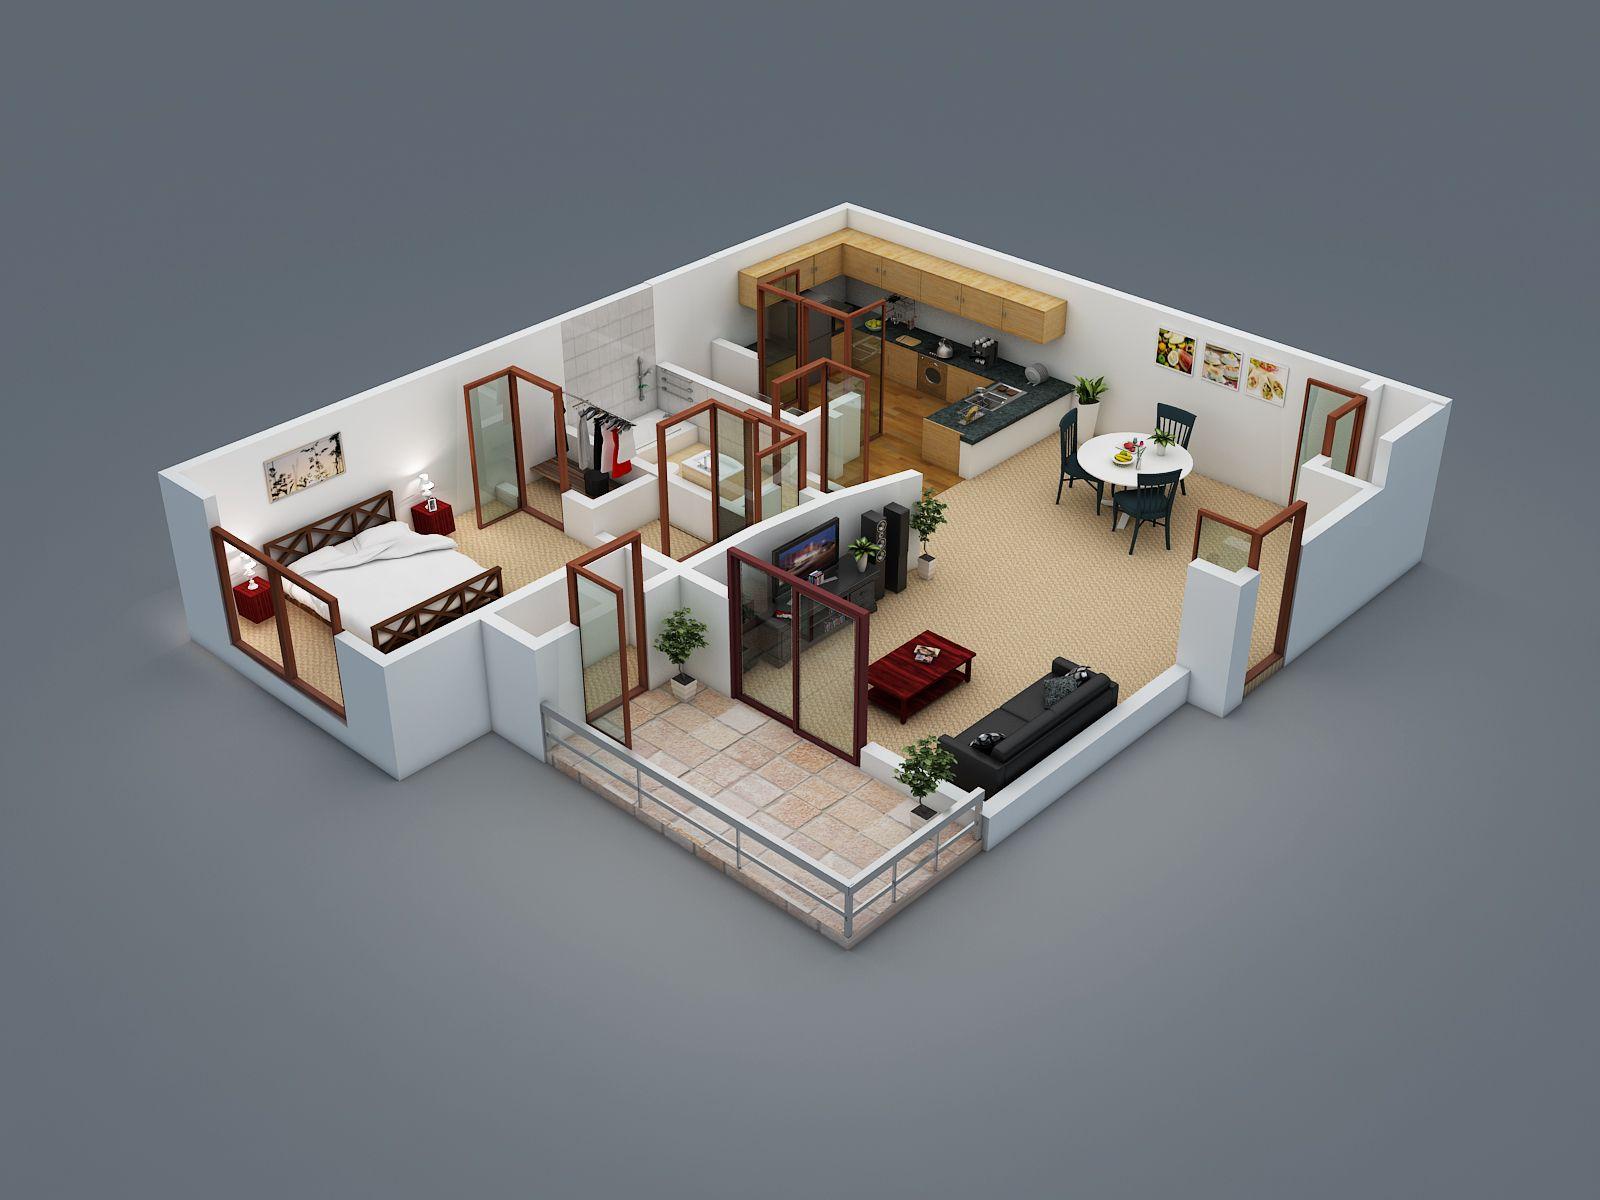 Architectural 3D Floor Plan